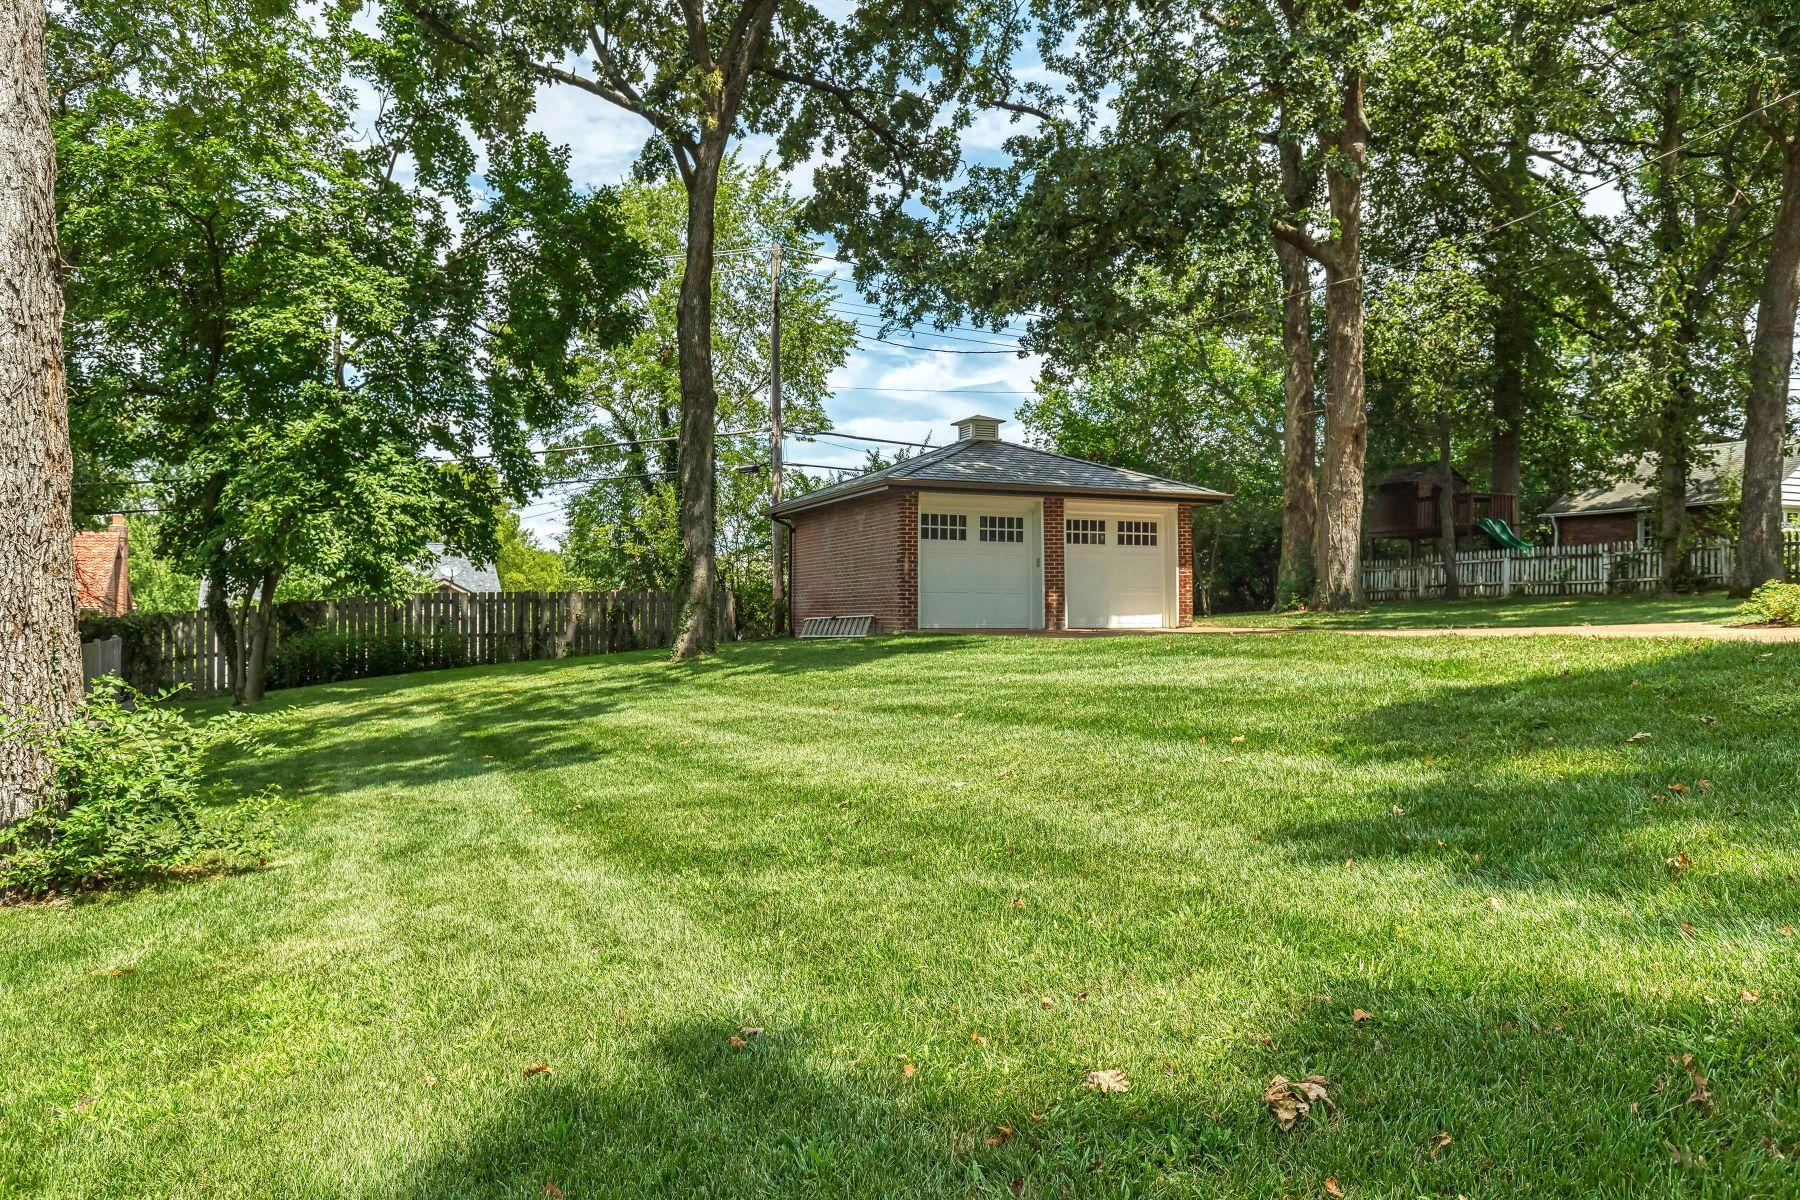 Additional photo for property listing at A Beautiful University City Renovation by Period Restoration 7149 Lindell Boulevard University City, Missouri 63130 United States